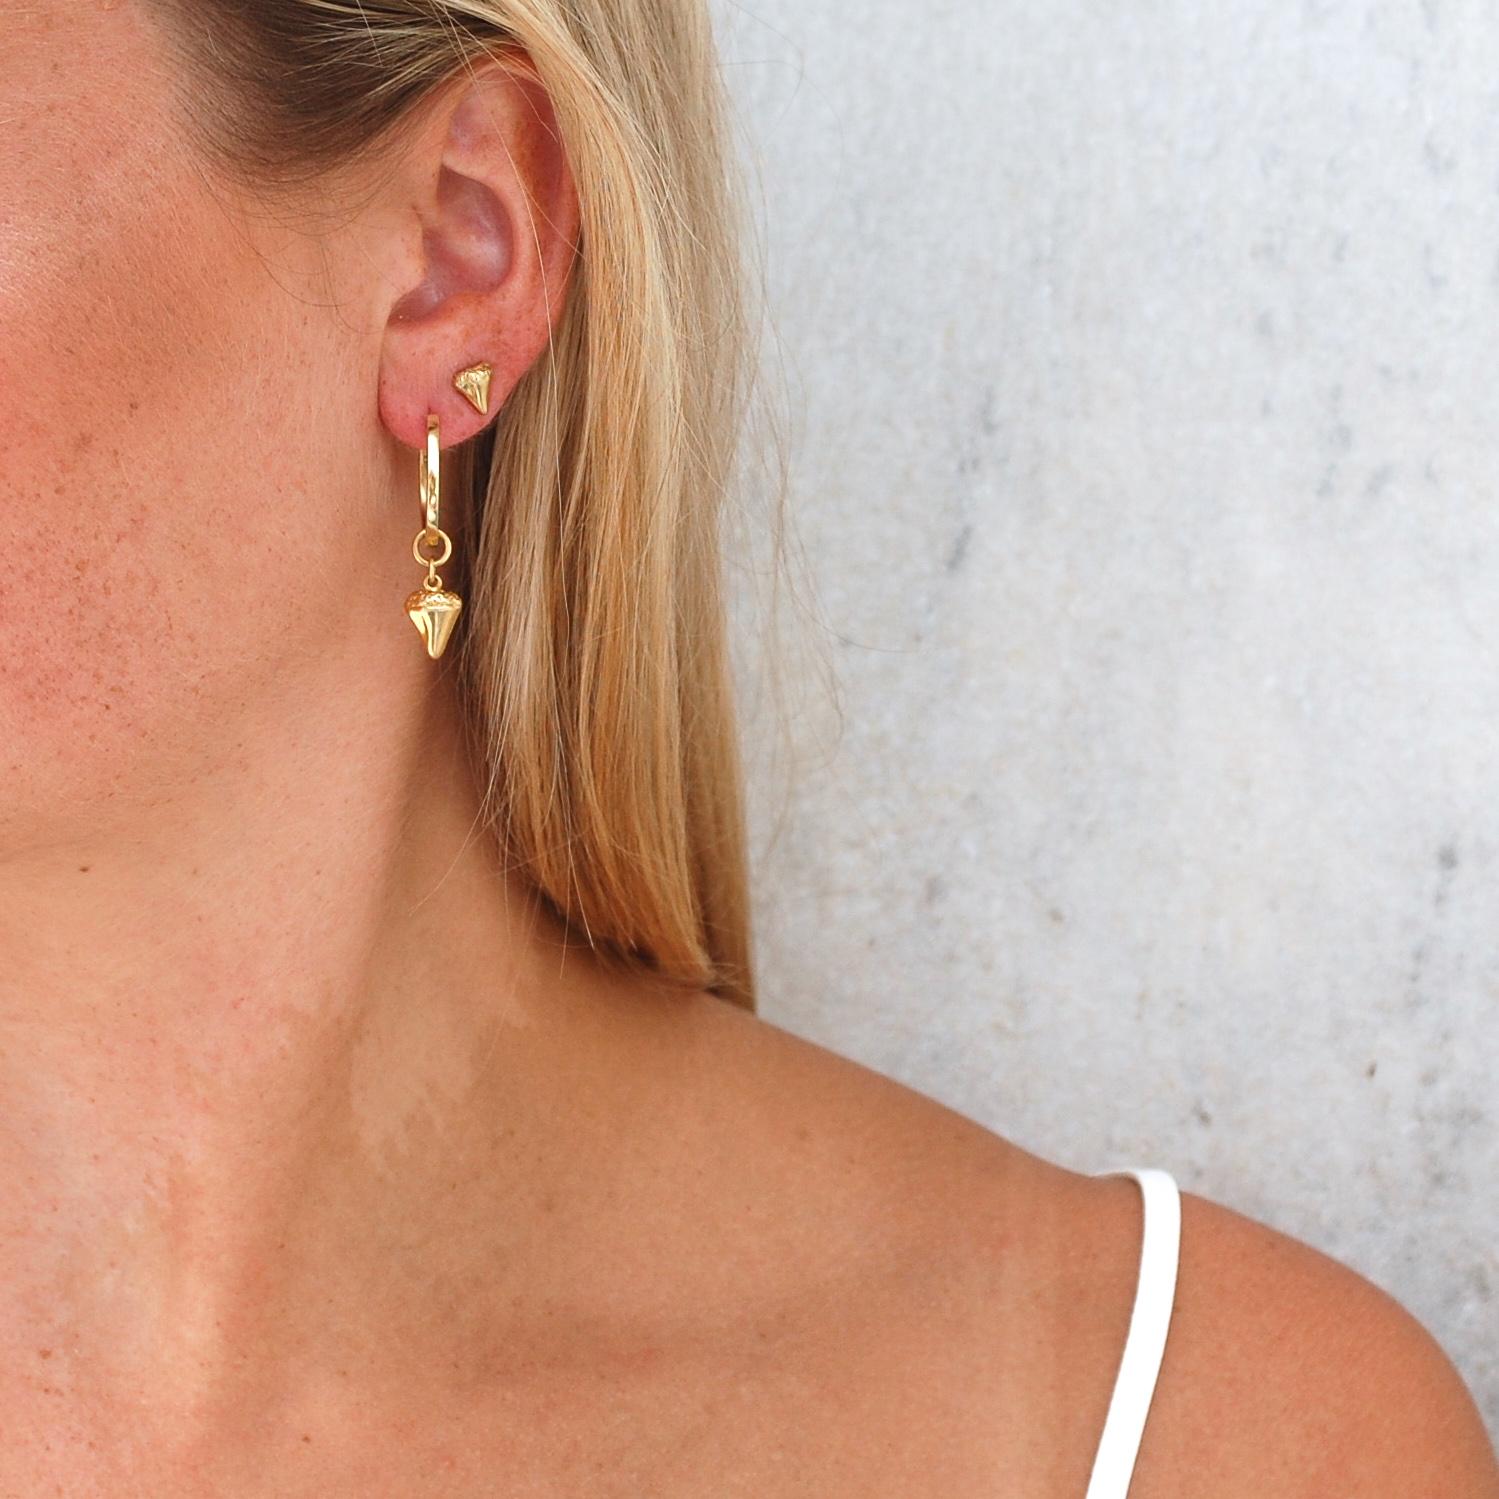 Bite Me Stud Earrings in Gold